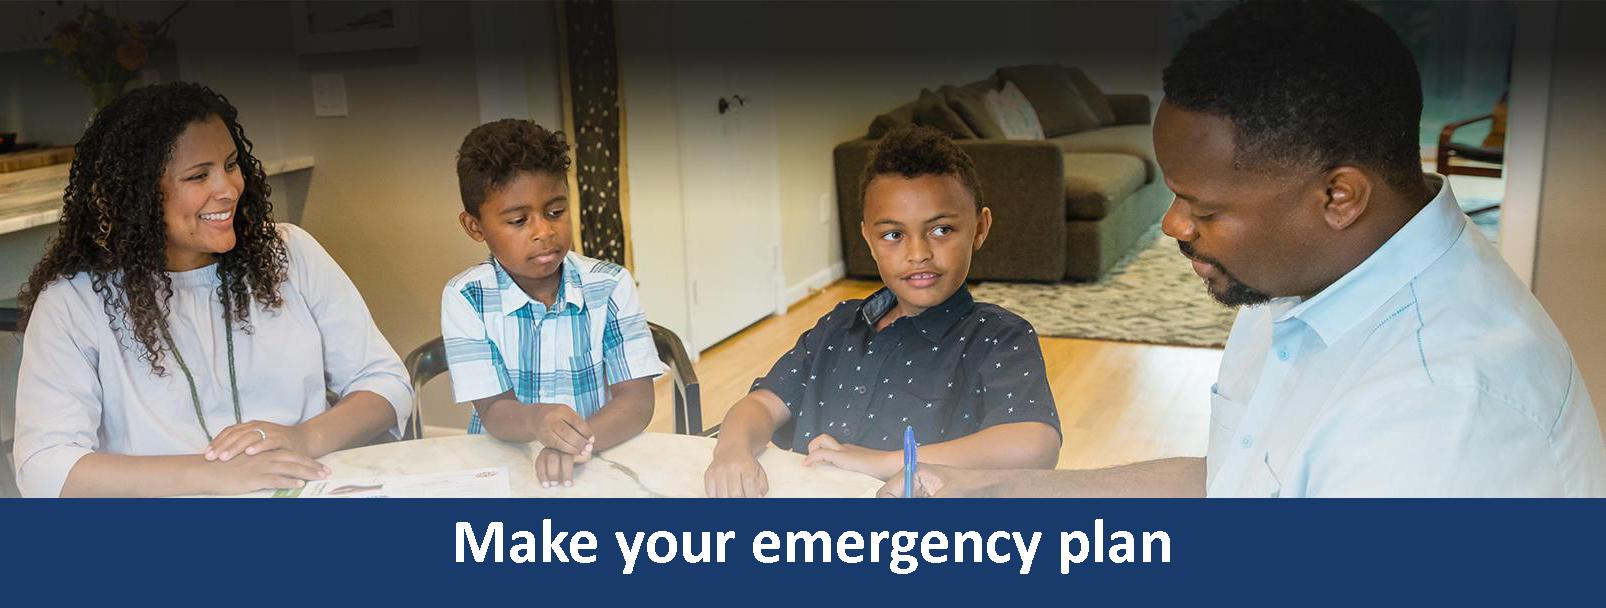 Make your emergency plan